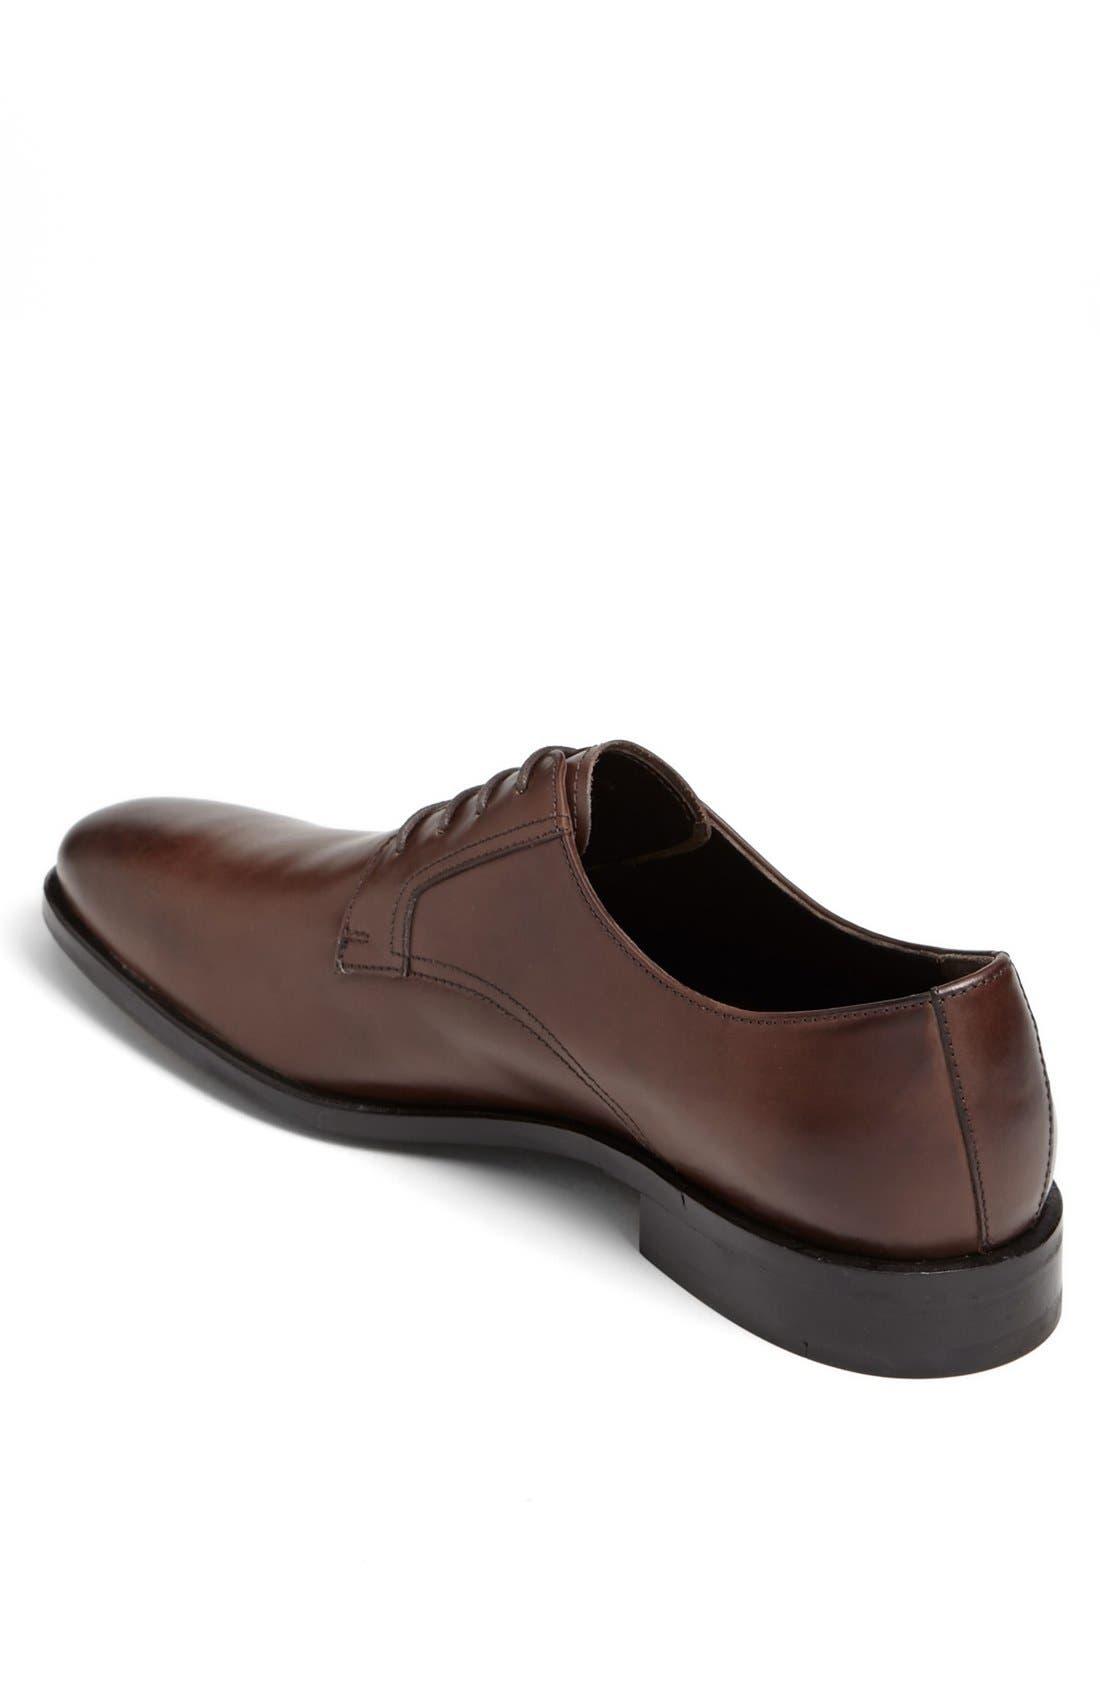 Alternate Image 2  - Calibrate 'Reno' Plain Toe Derby (Men)